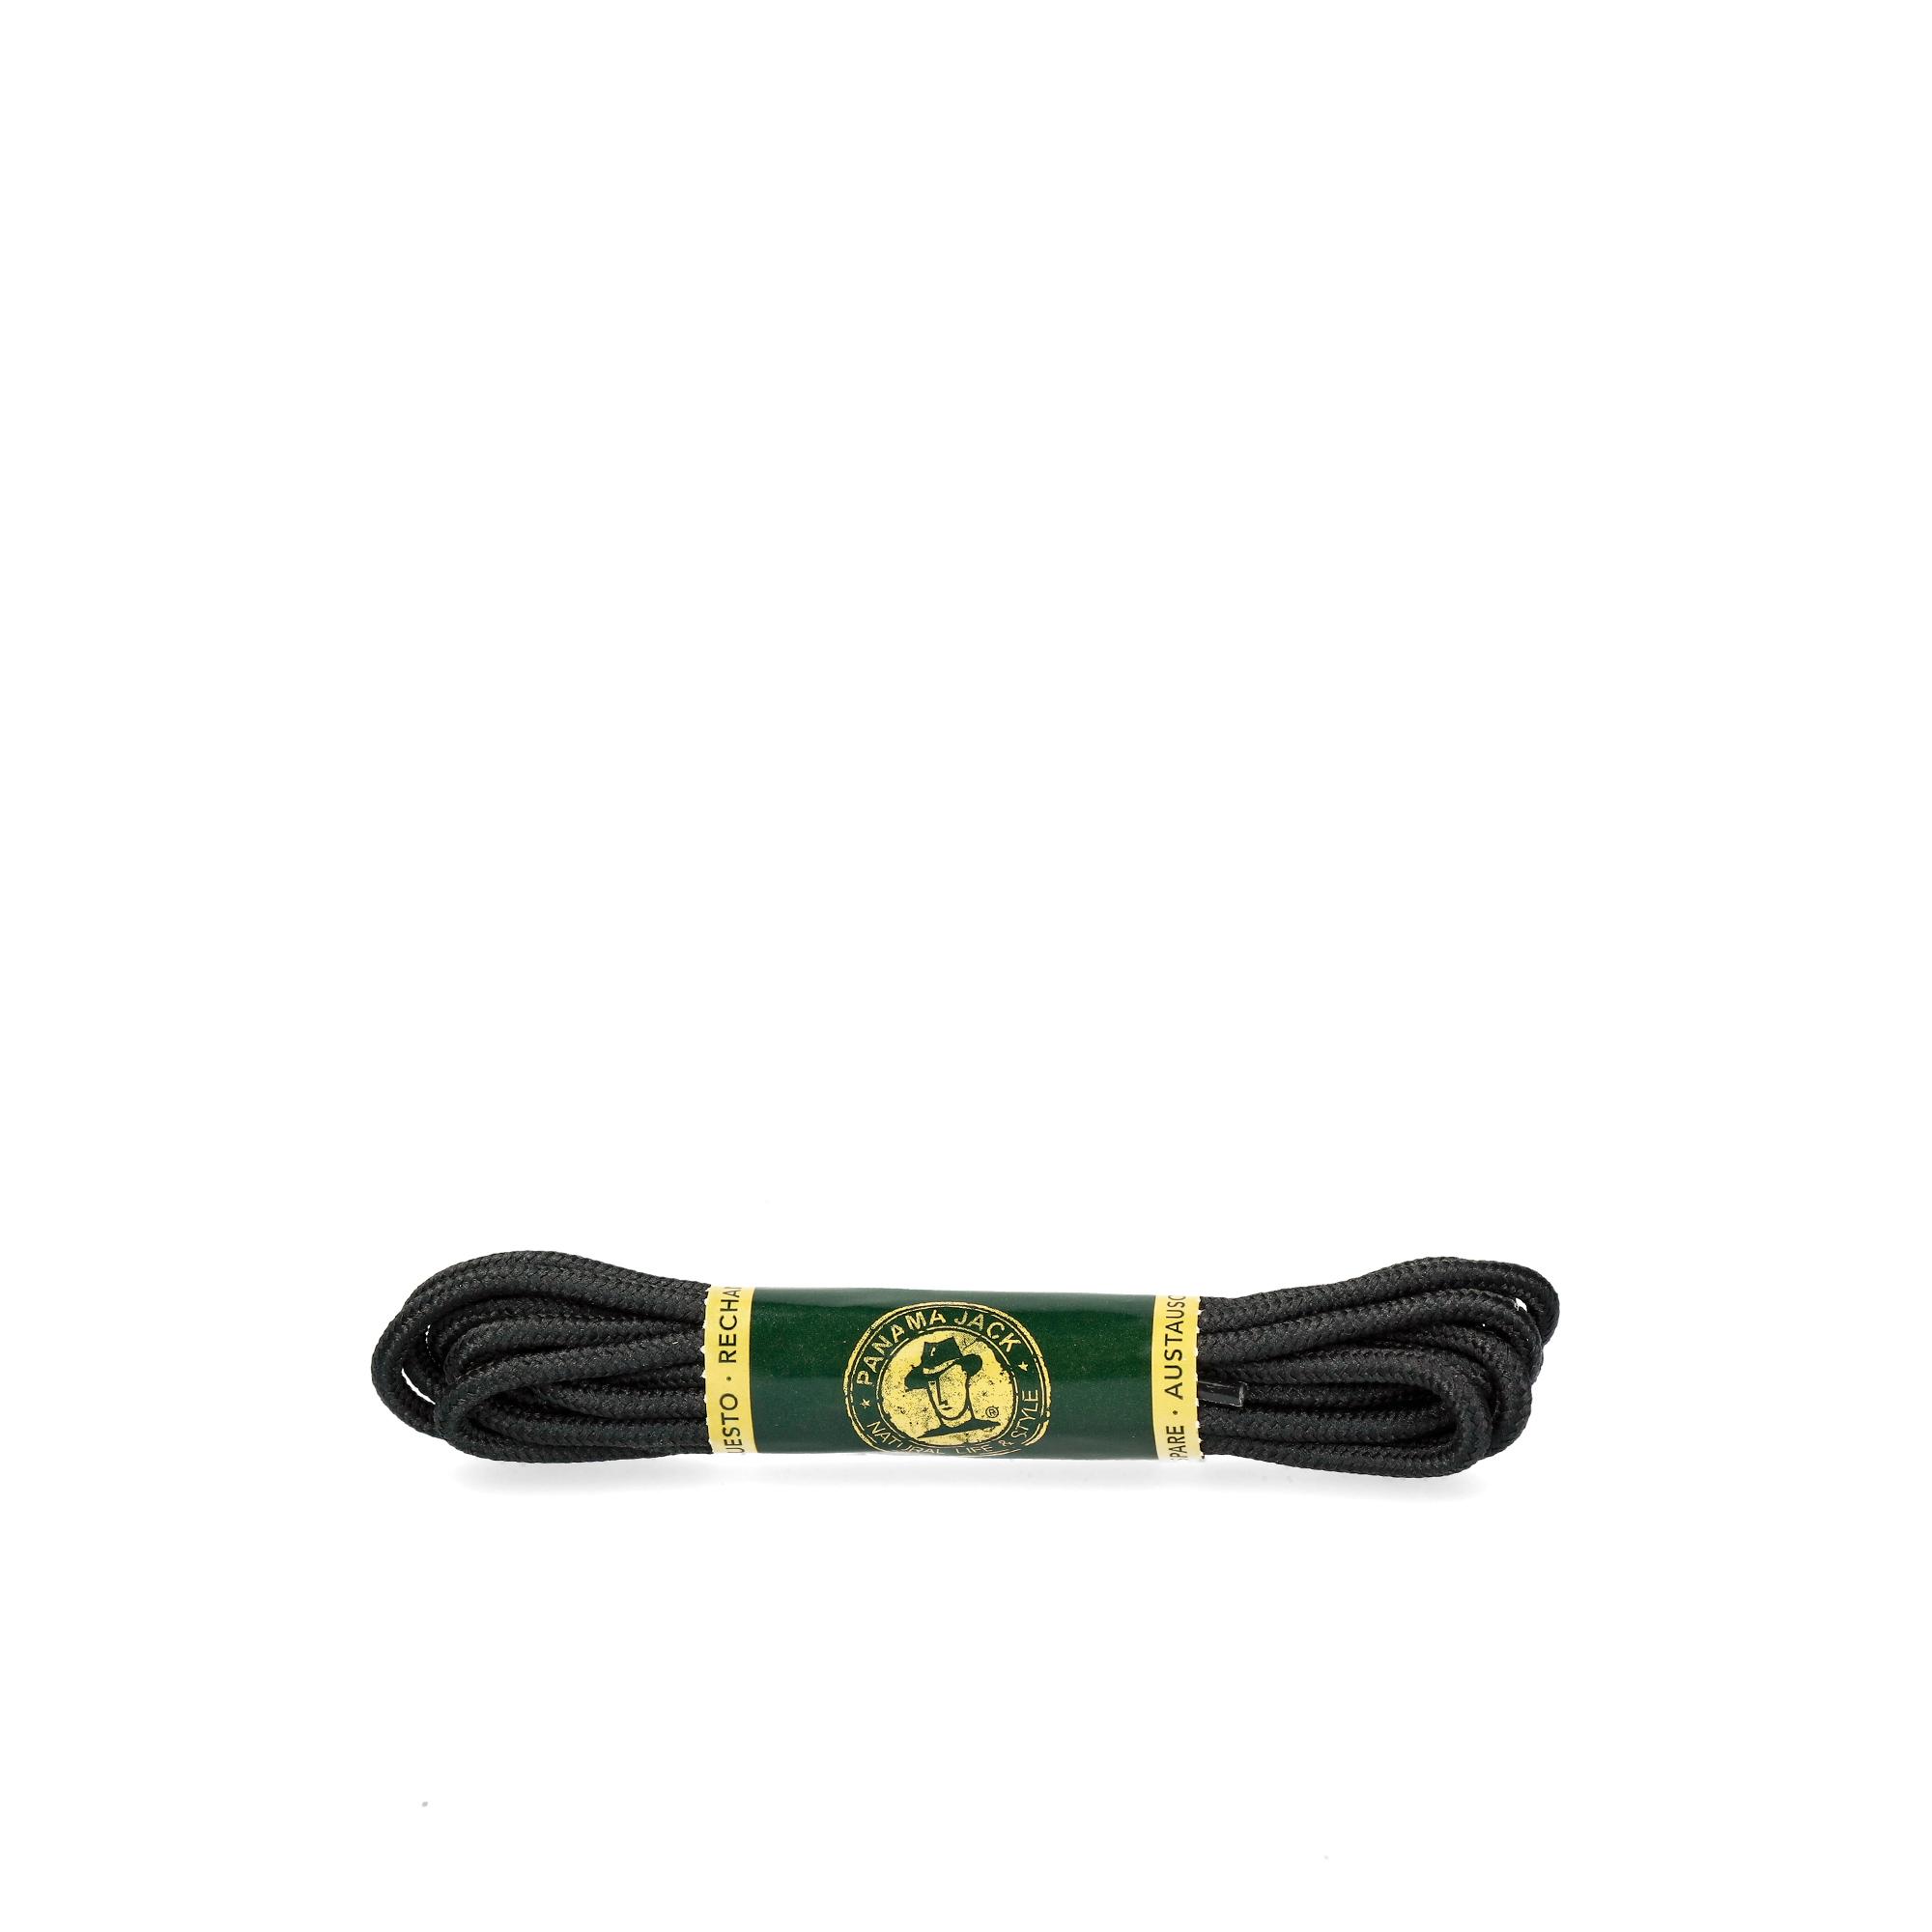 Shoelaces 135 Cm in black Black Poliester